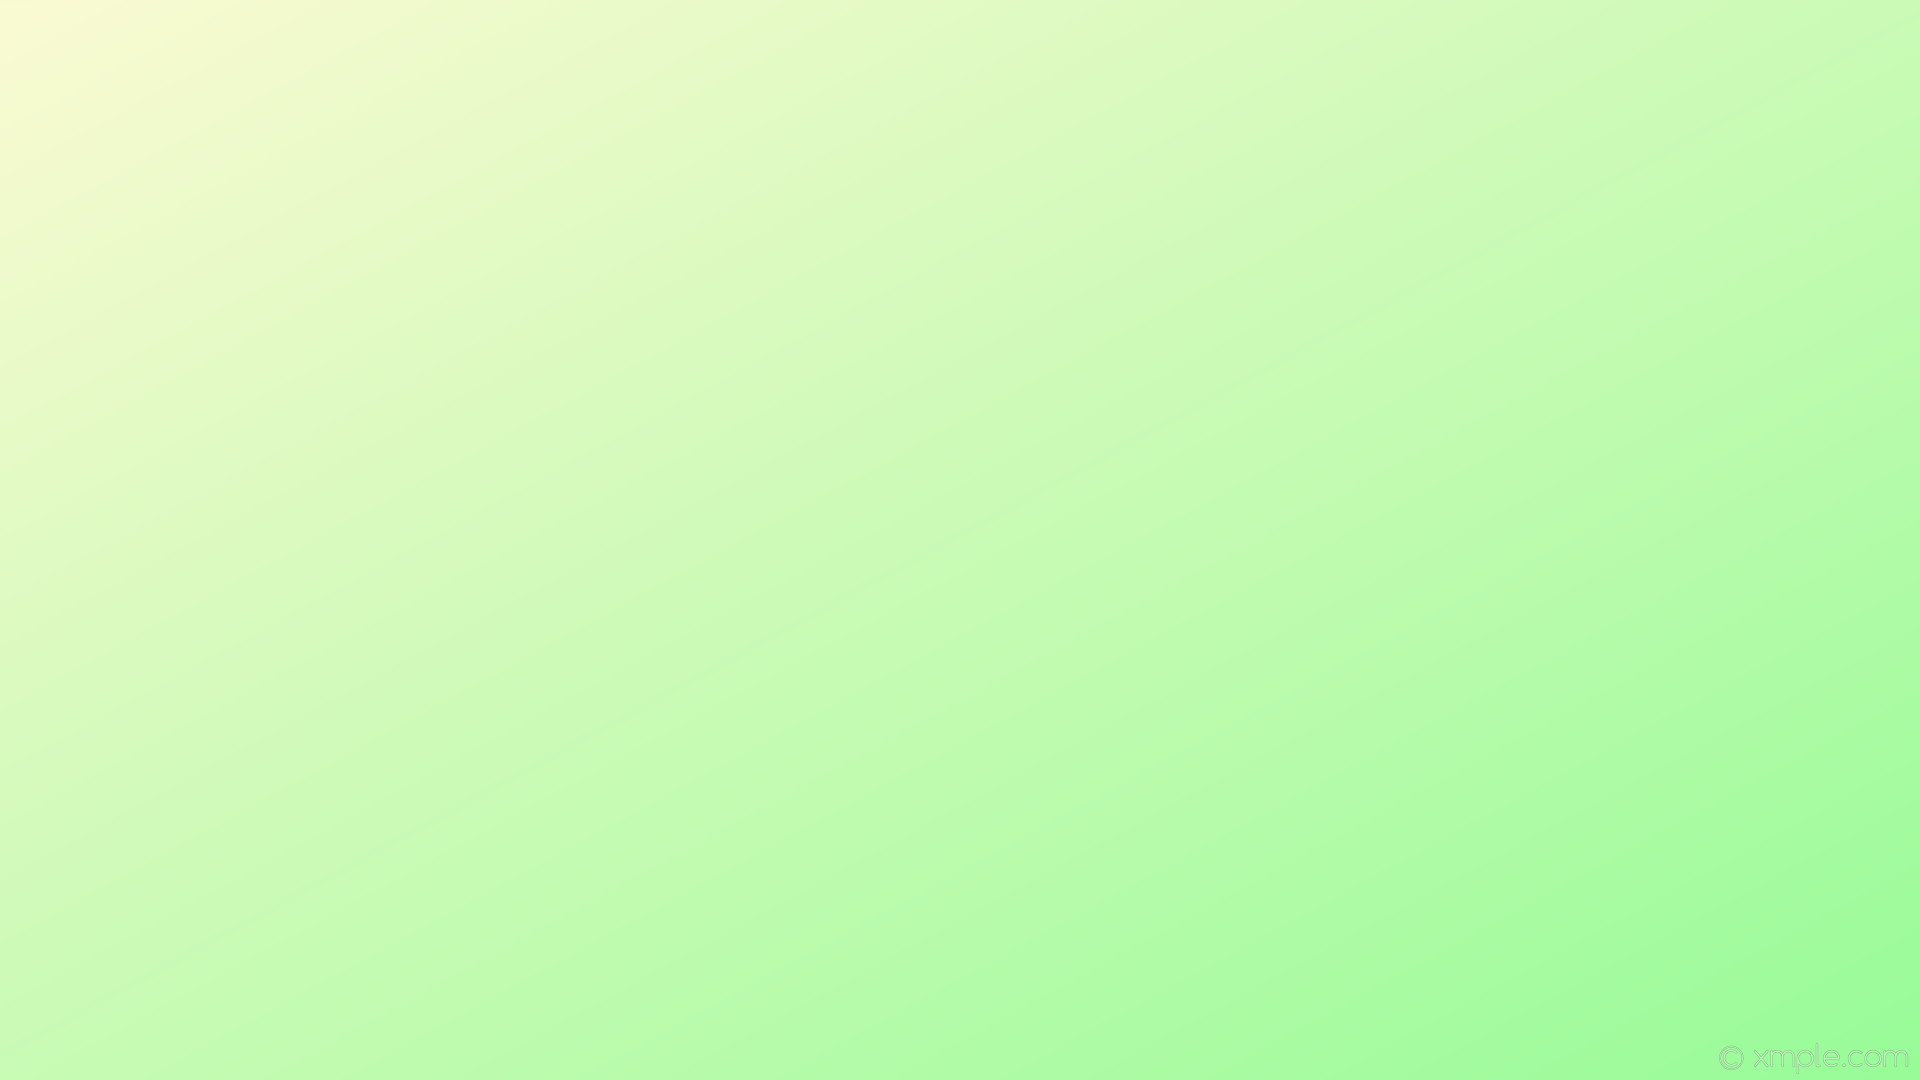 wallpaper linear green gradient yellow pale green light goldenrod yellow  #98fb98 #fafad2 330°